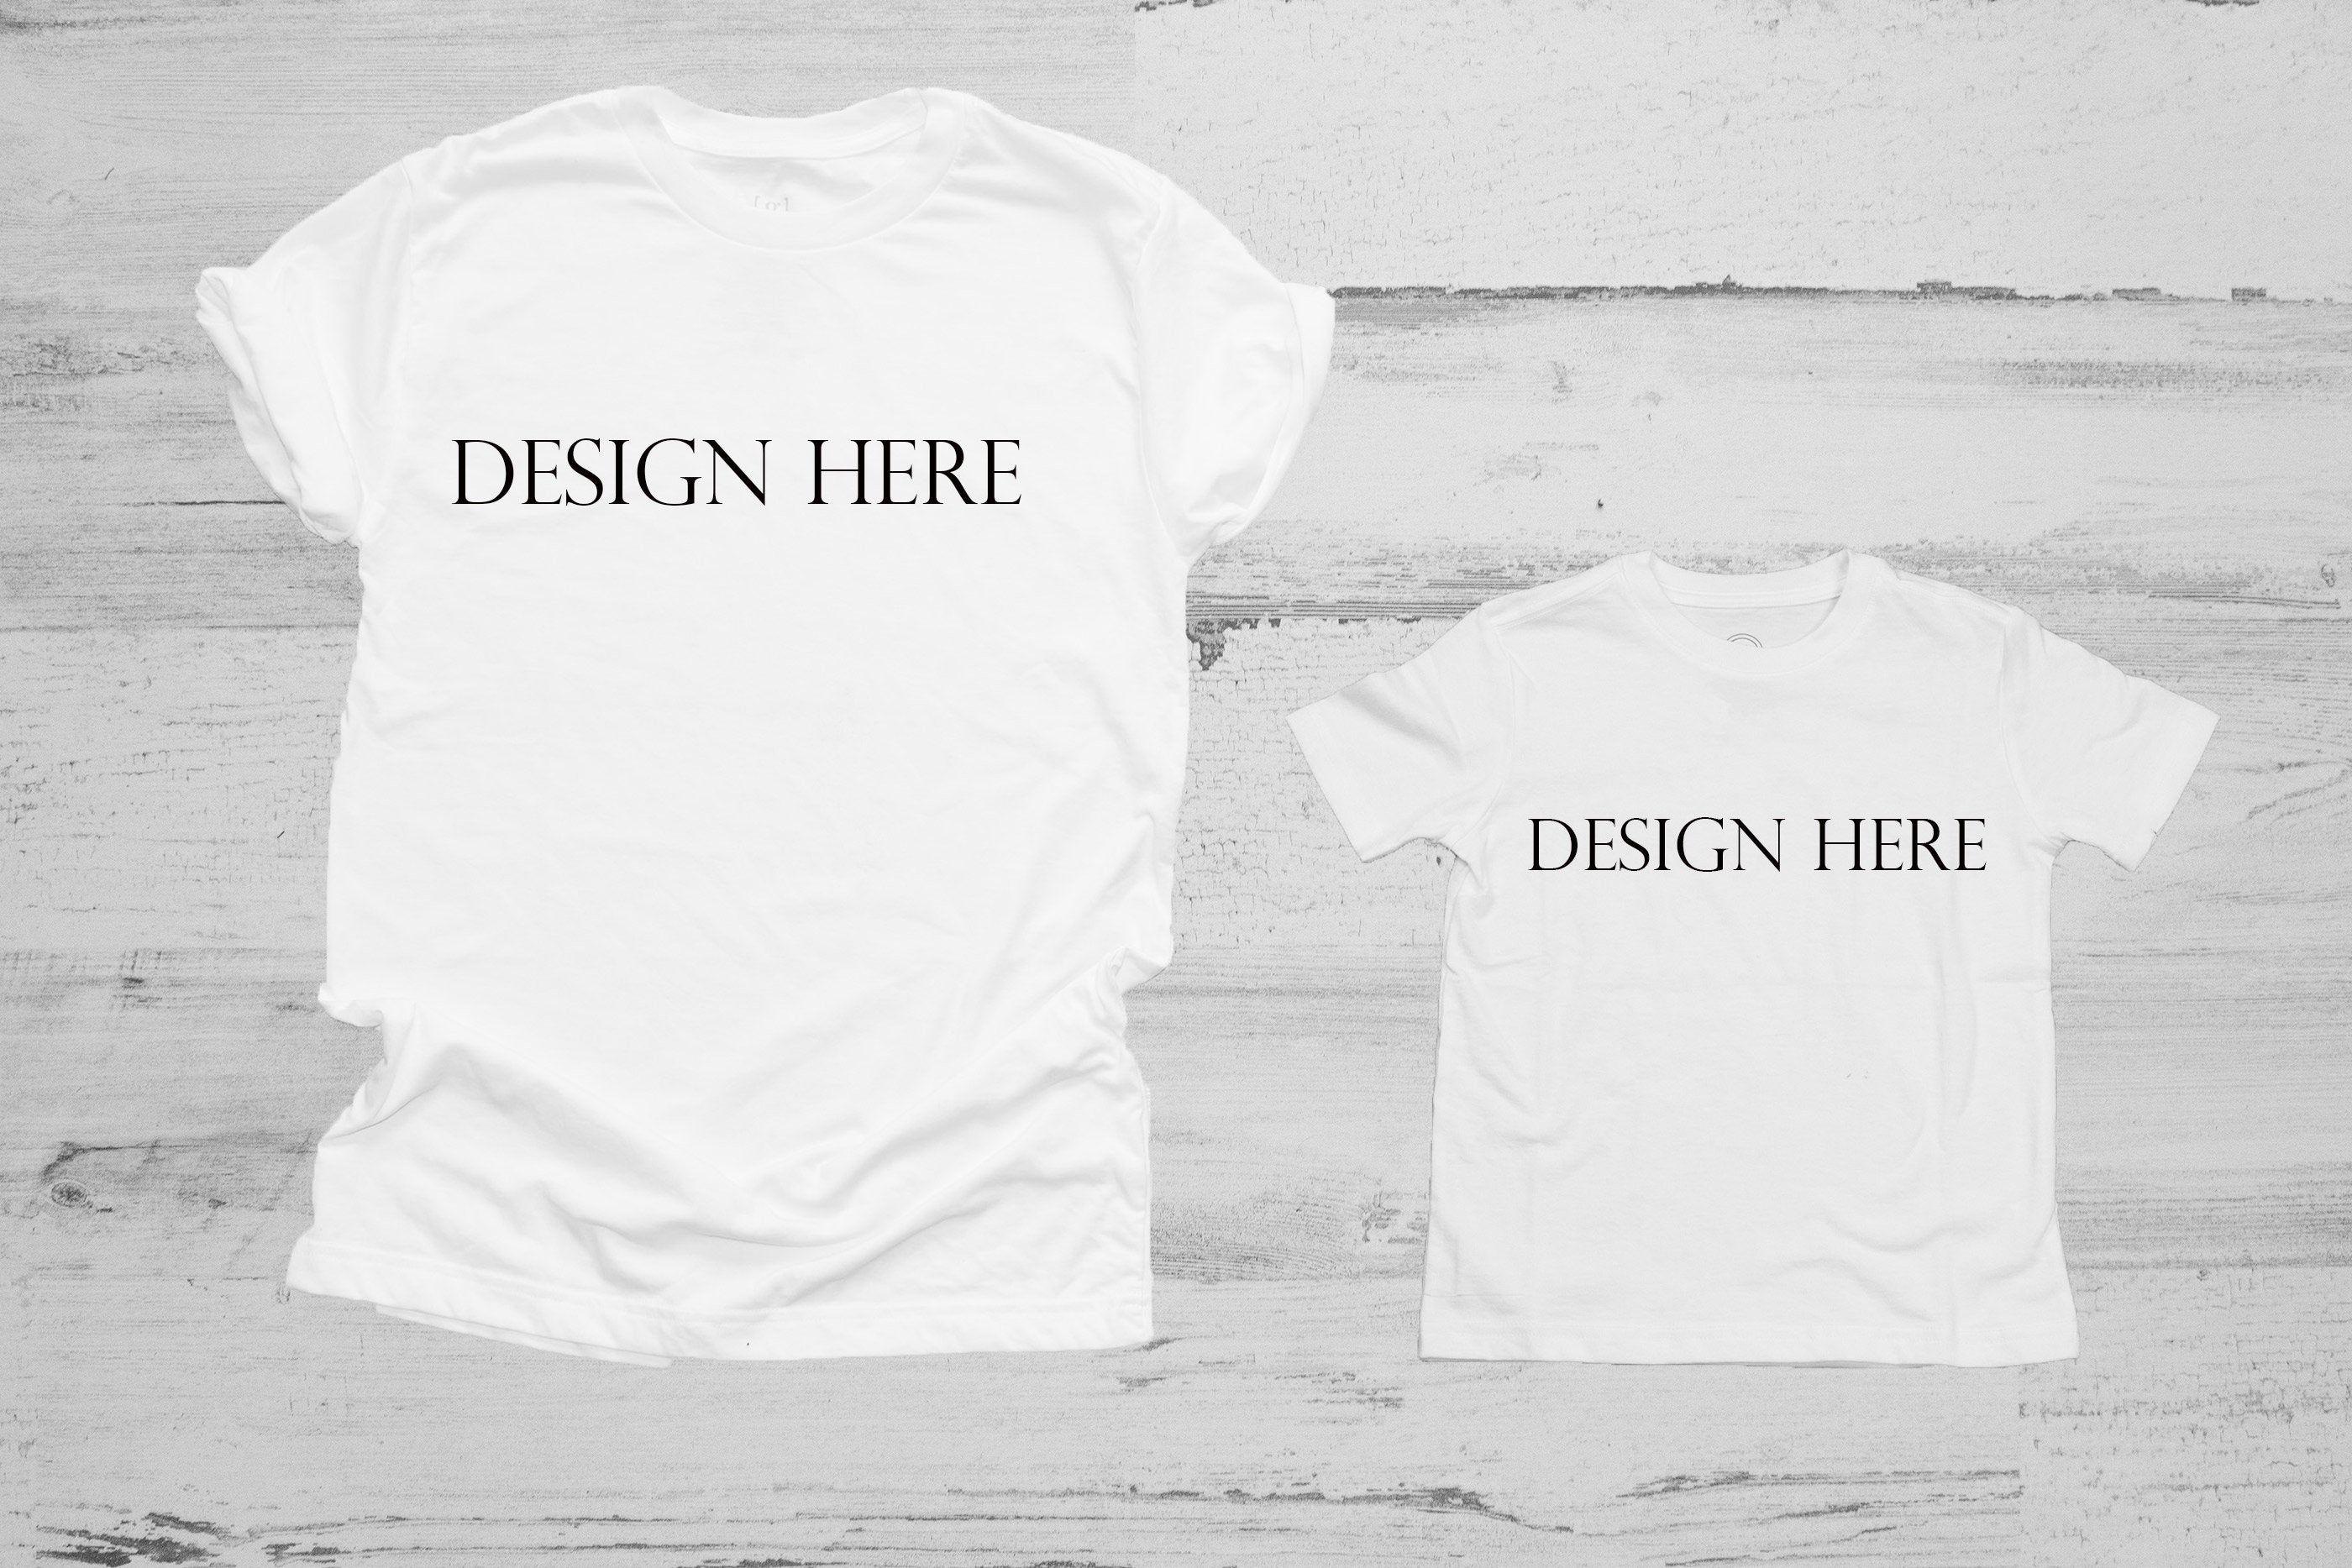 Download Mom And Me Shirt Mockup White Shirt Mockup Kids Mockup Kids Etsy Mom And Me Shirts Shirt Mockup Shirt Designs